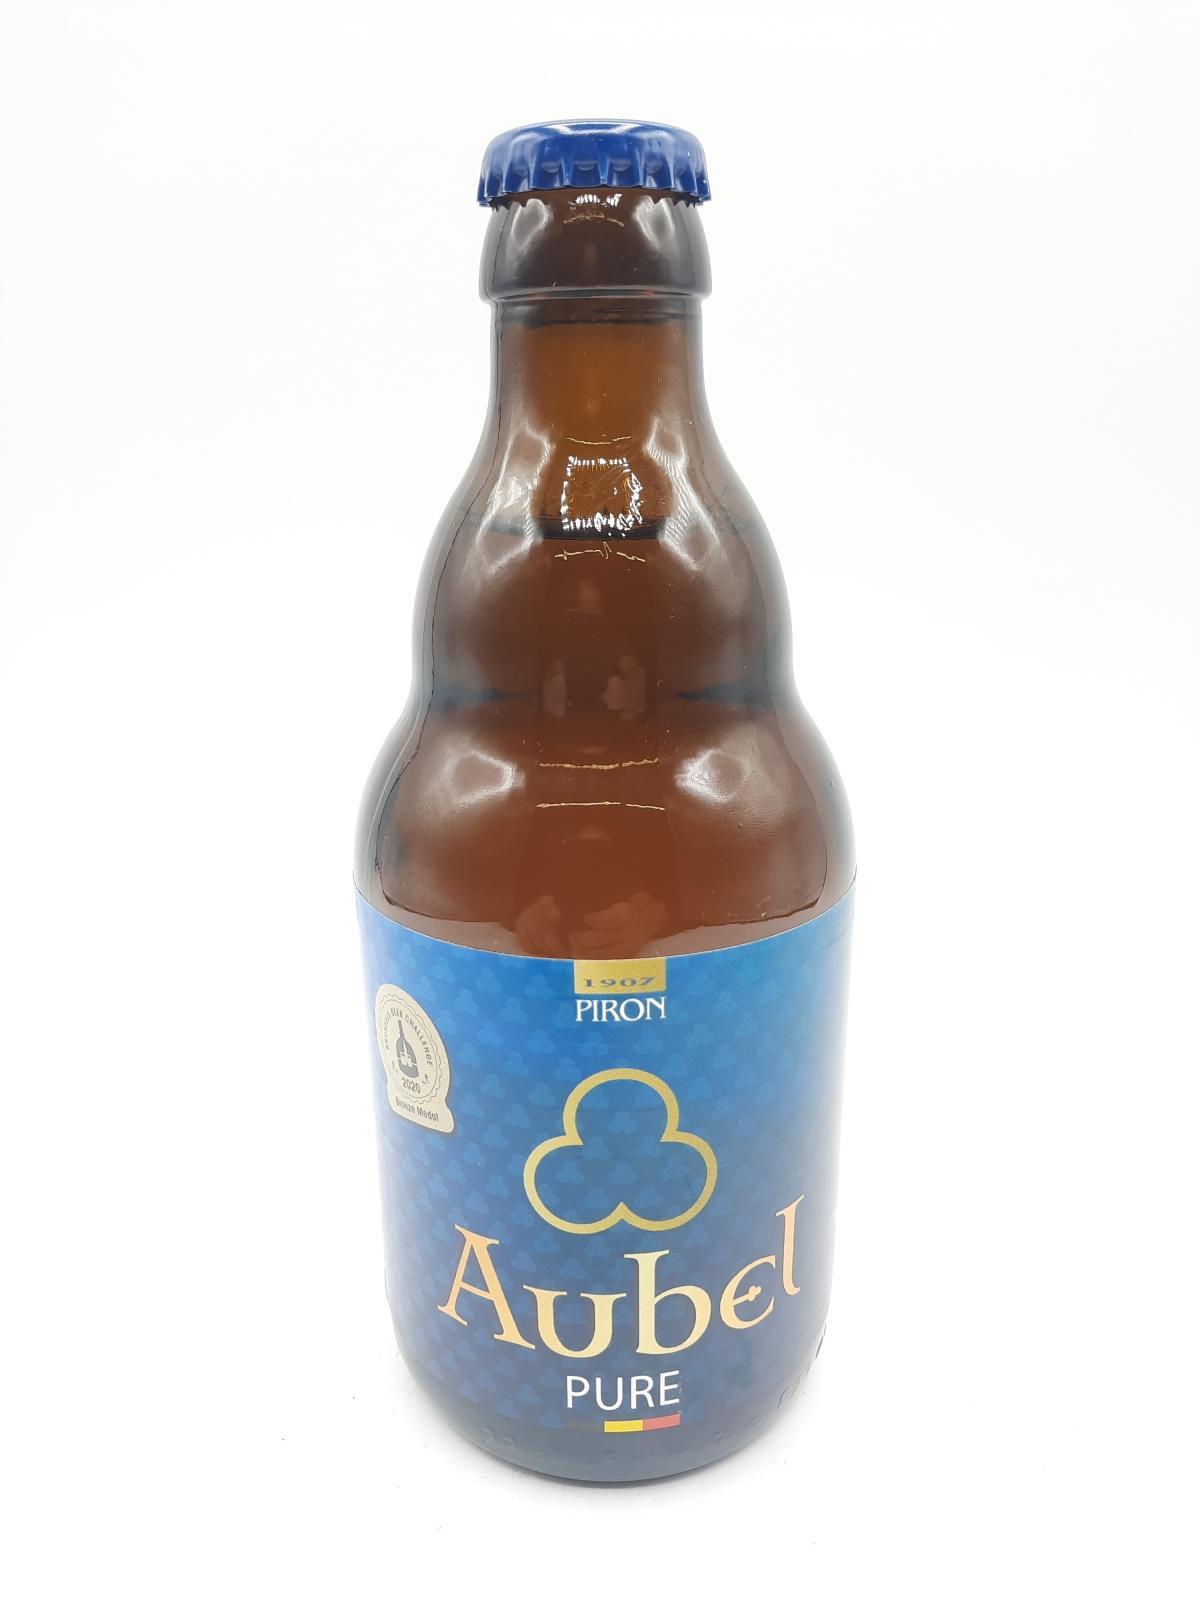 Image Aubel Pure